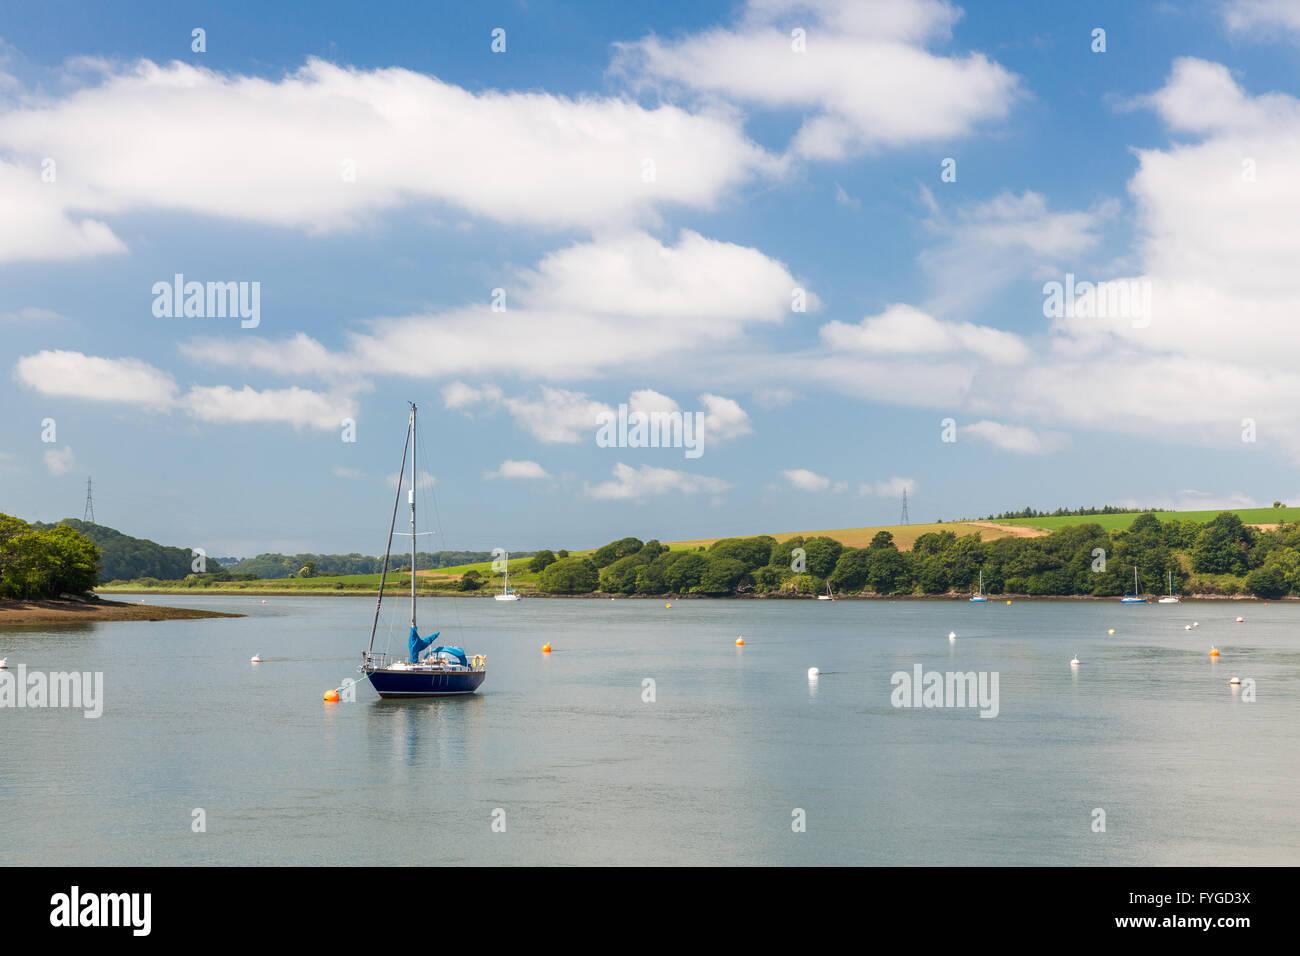 Lawrenny Quay - Pembrokeshire - Stock Image